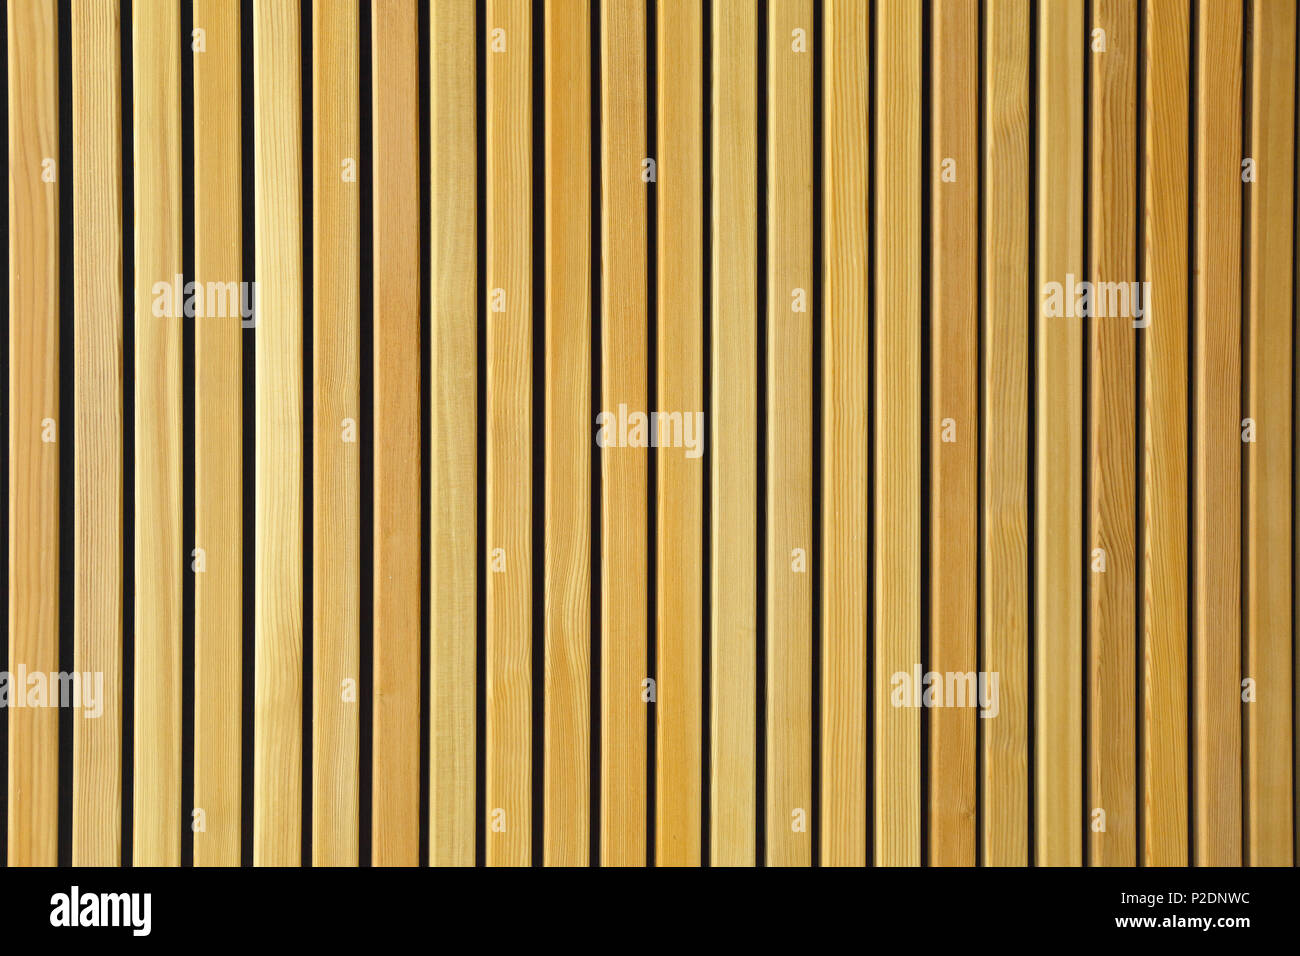 Licht Holz Textur mit Plank Boards Stockfoto, Bild: 208056280 - Alamy